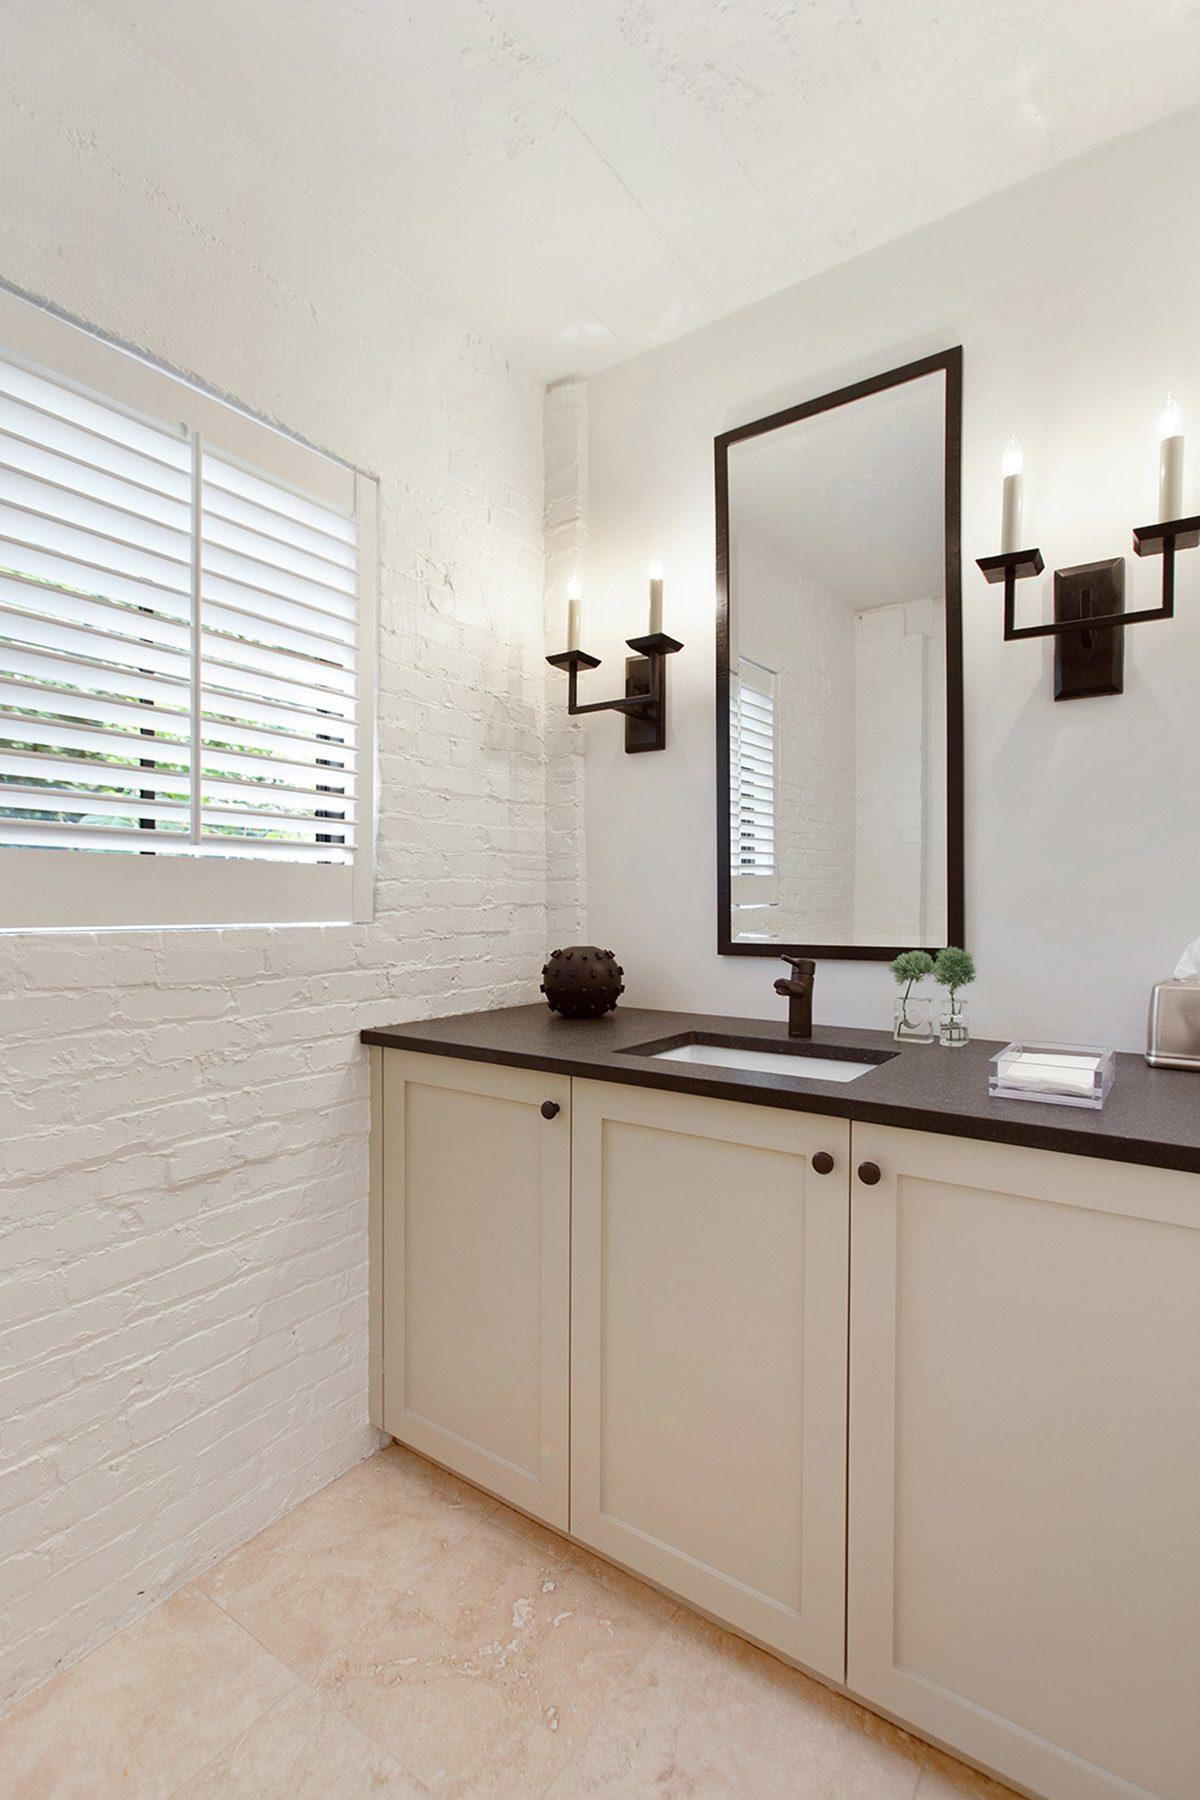 Painted white brick walls inside a bathroom.